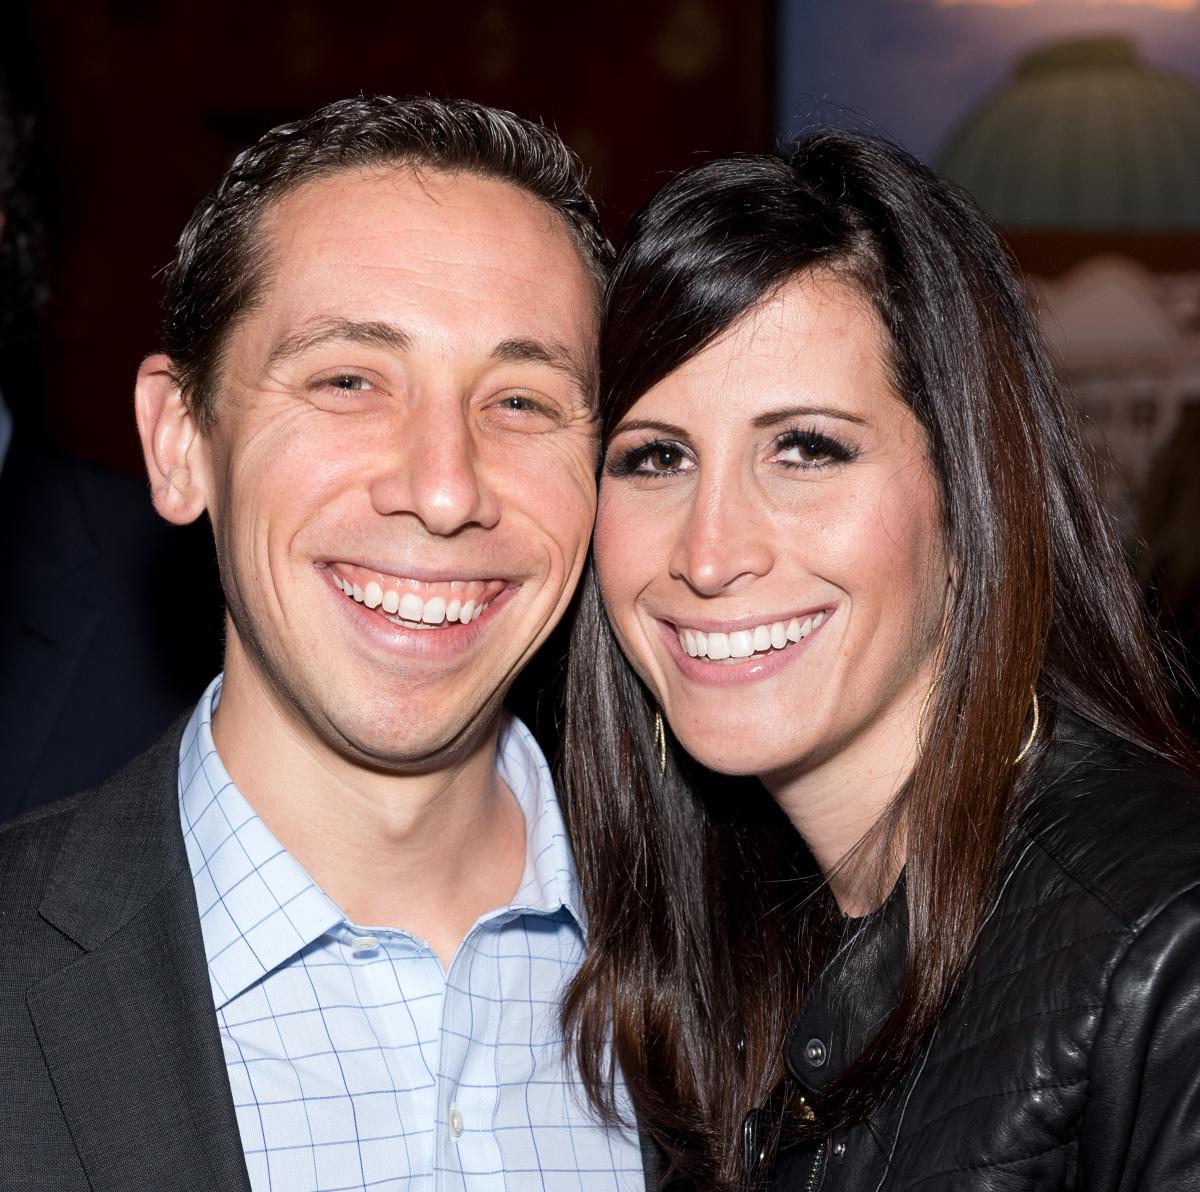 News, NCJW gala, Nov. 2015, Brian Abramson, Lori Abramson.